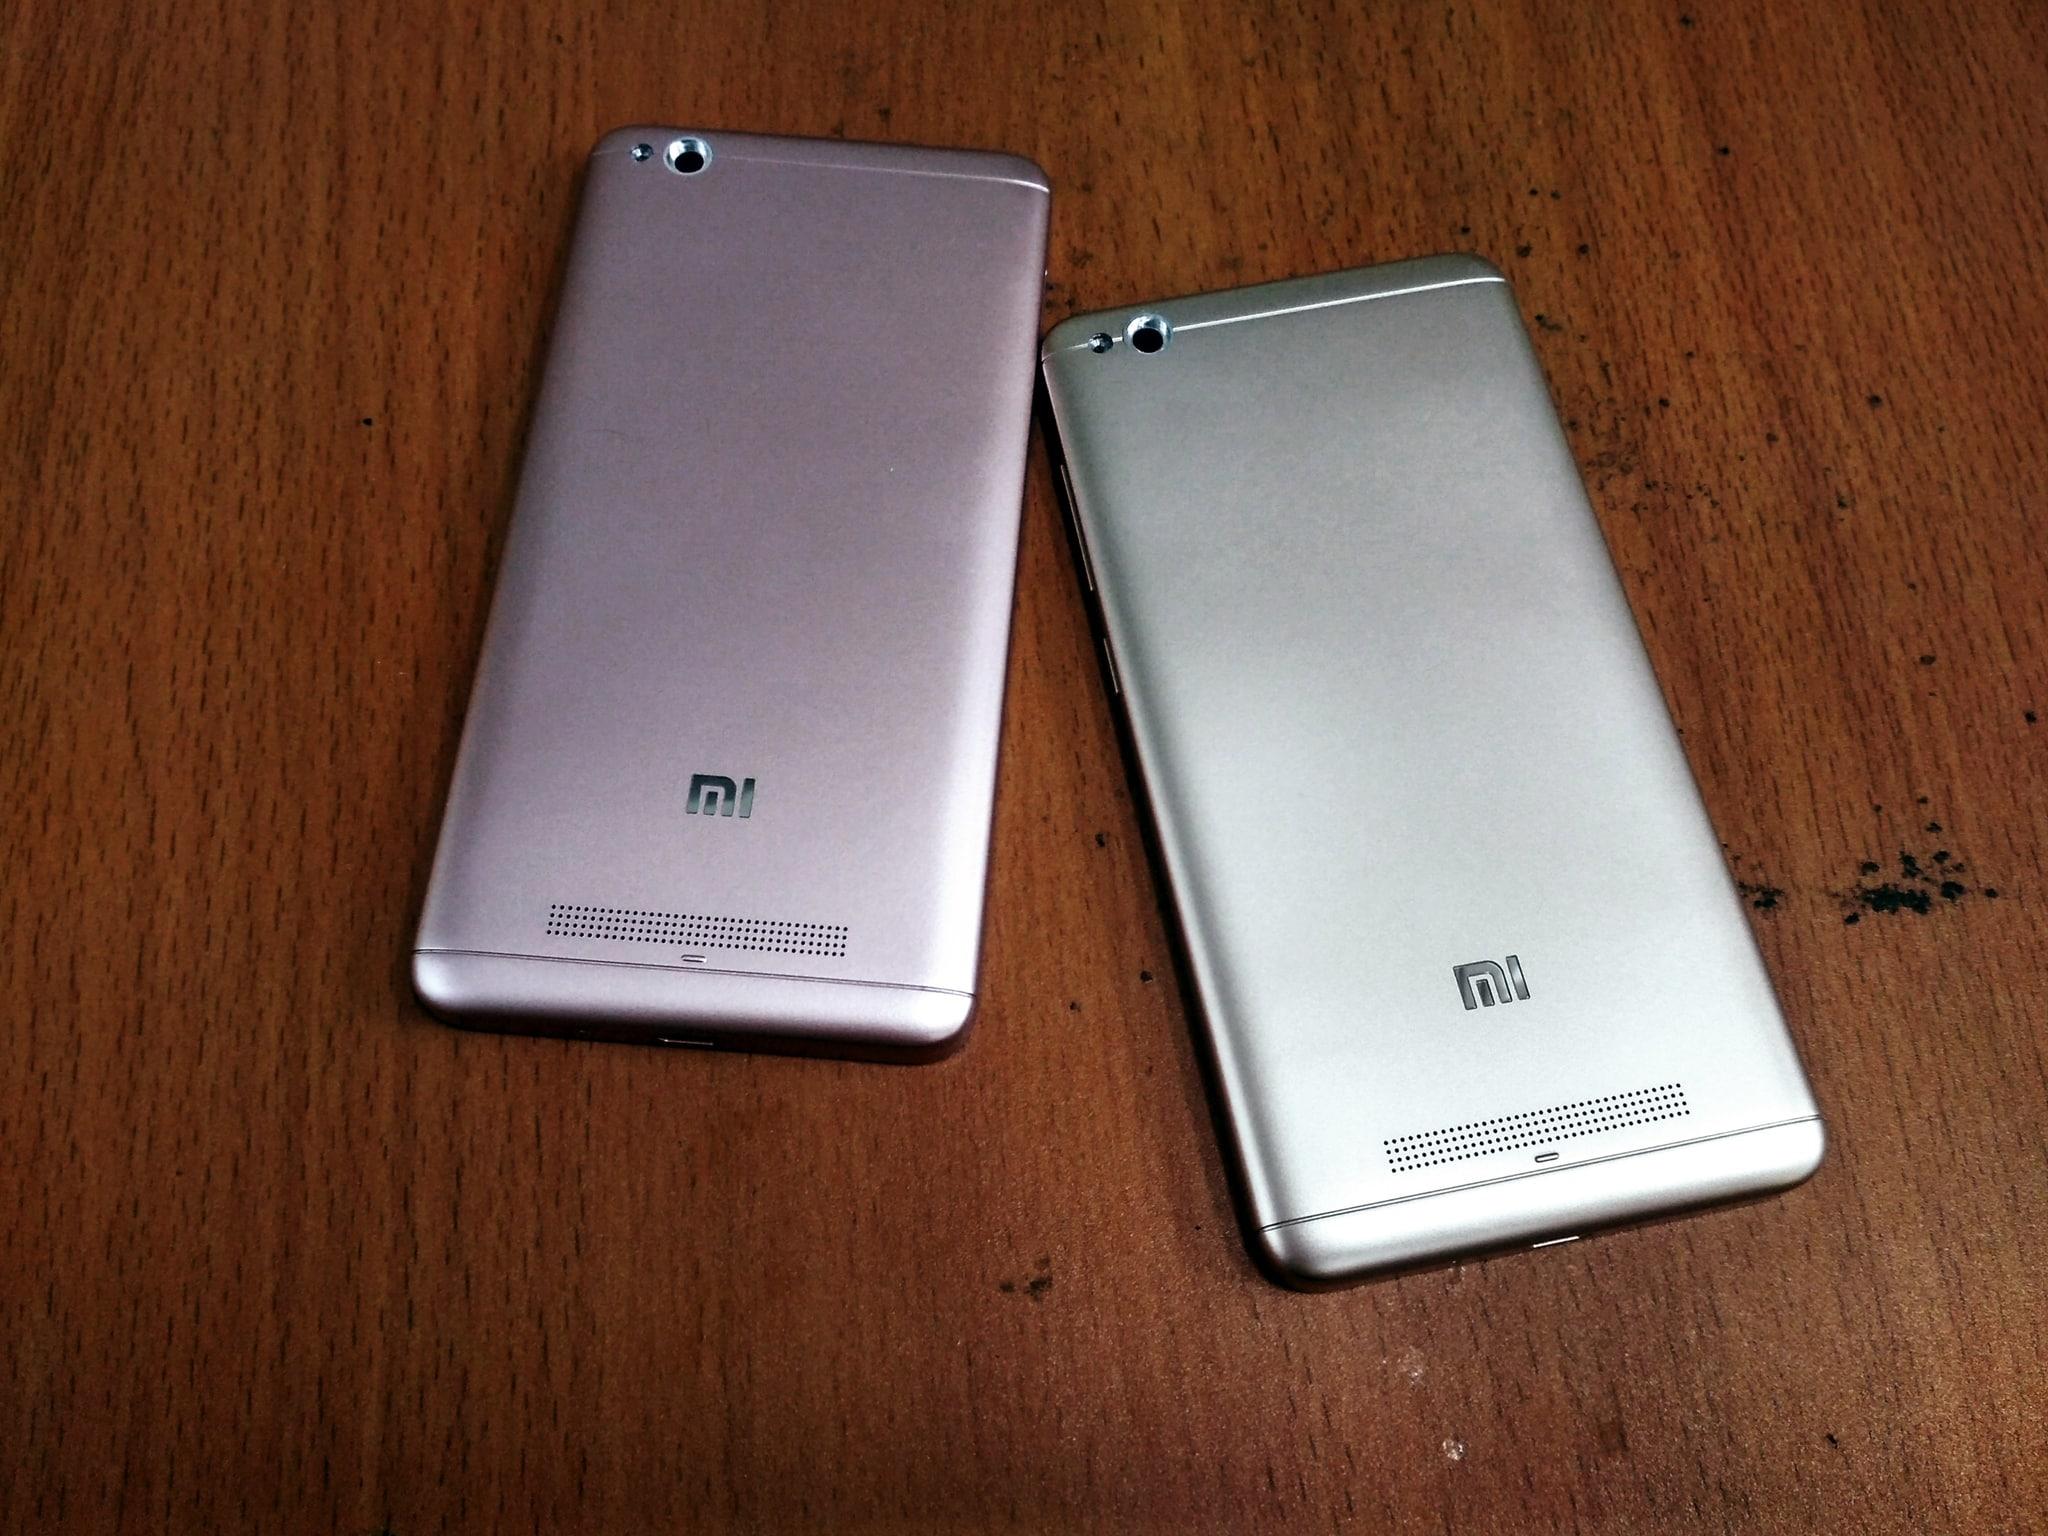 Jual Xiaomi Redmi 4a Original Backdoor Tutup Belakang Casing Housing Bollinger Cell Tokopedia